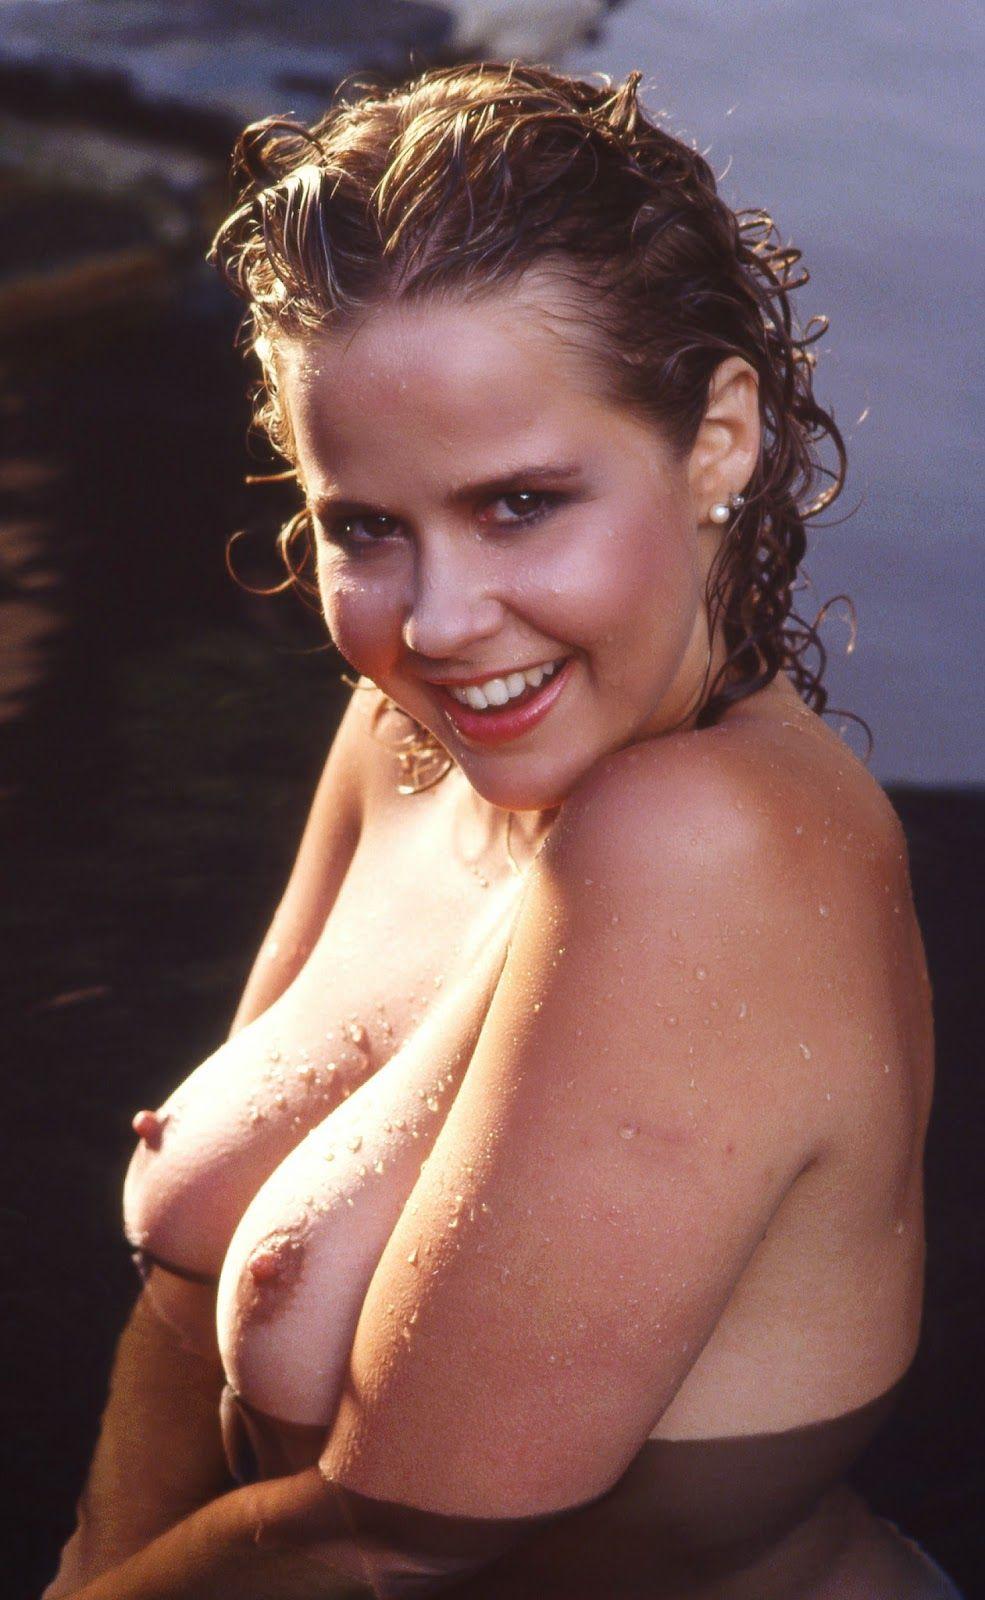 free-linda-blair-nude-images-titjob